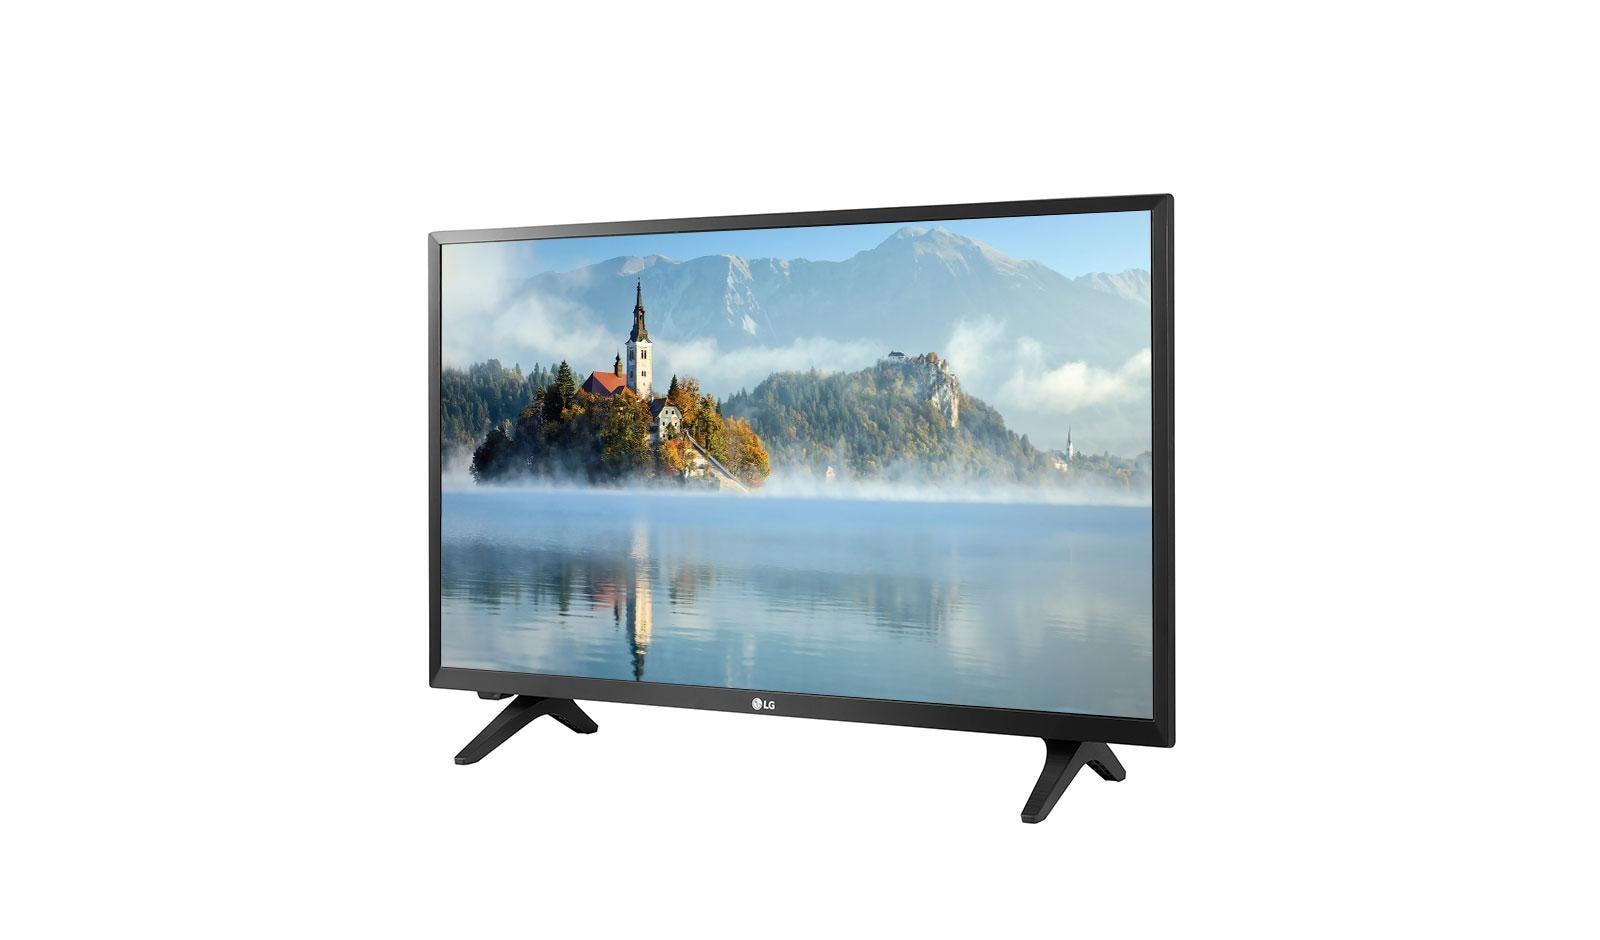 LG 28LJ400B-PU: 28-inch HD 720p LED TV | LG USA